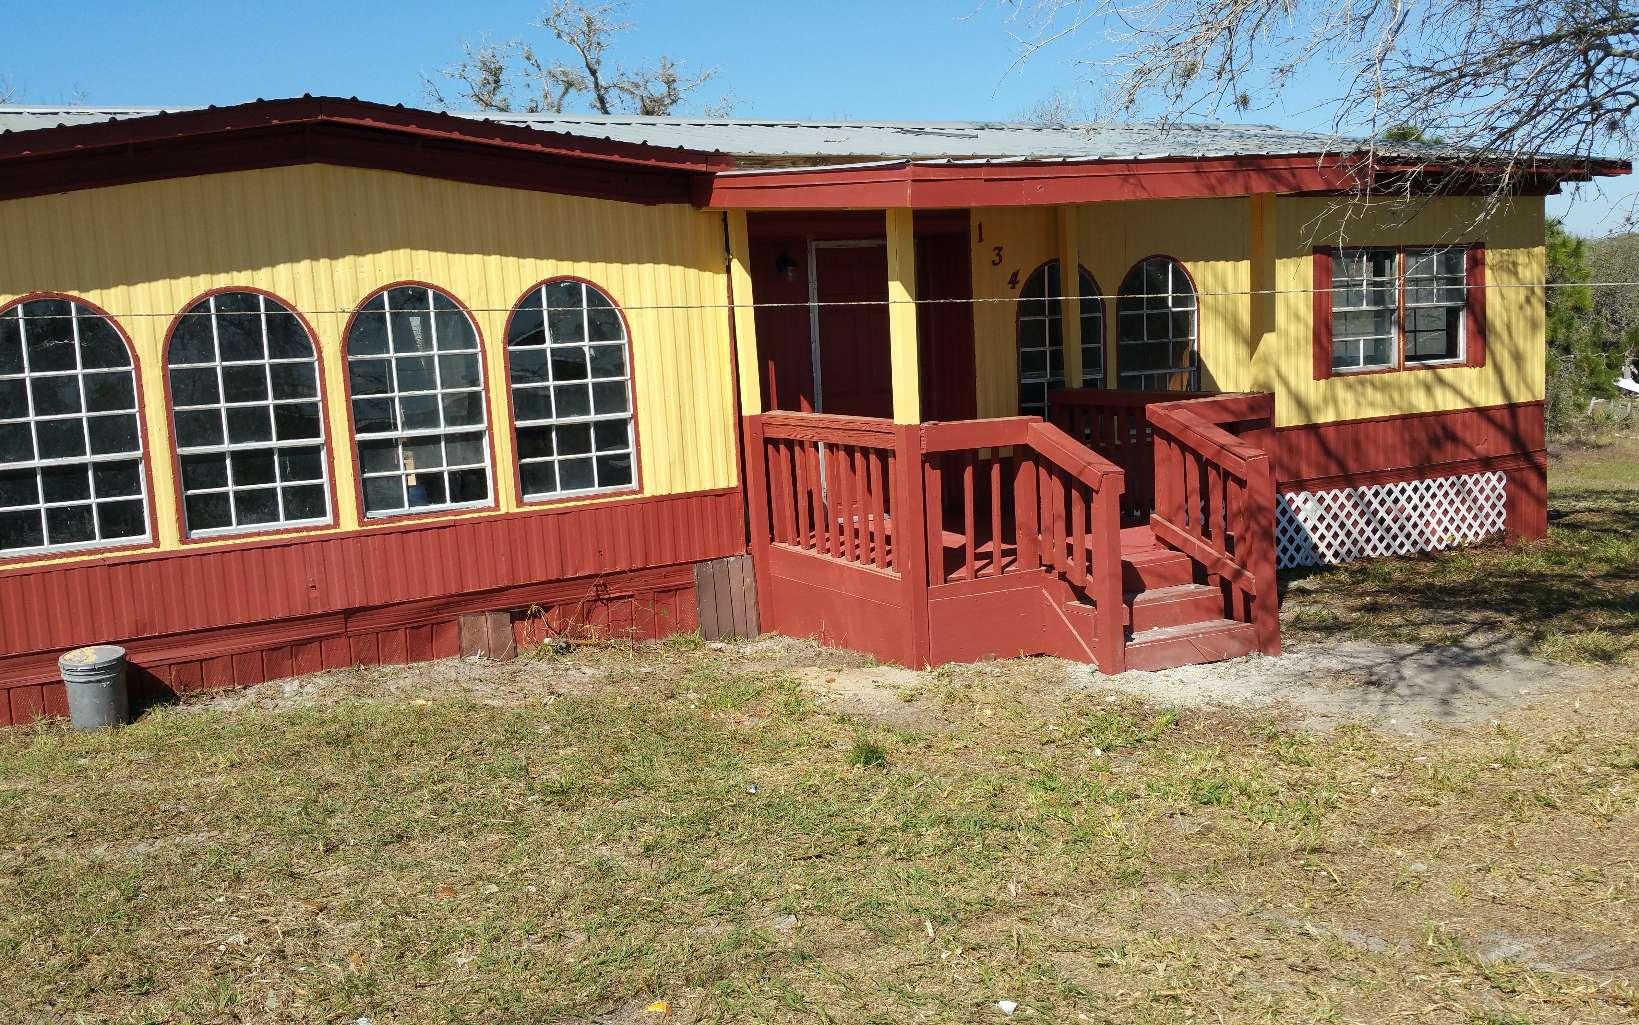 134 Orange St, Lake Placid, FL 33852